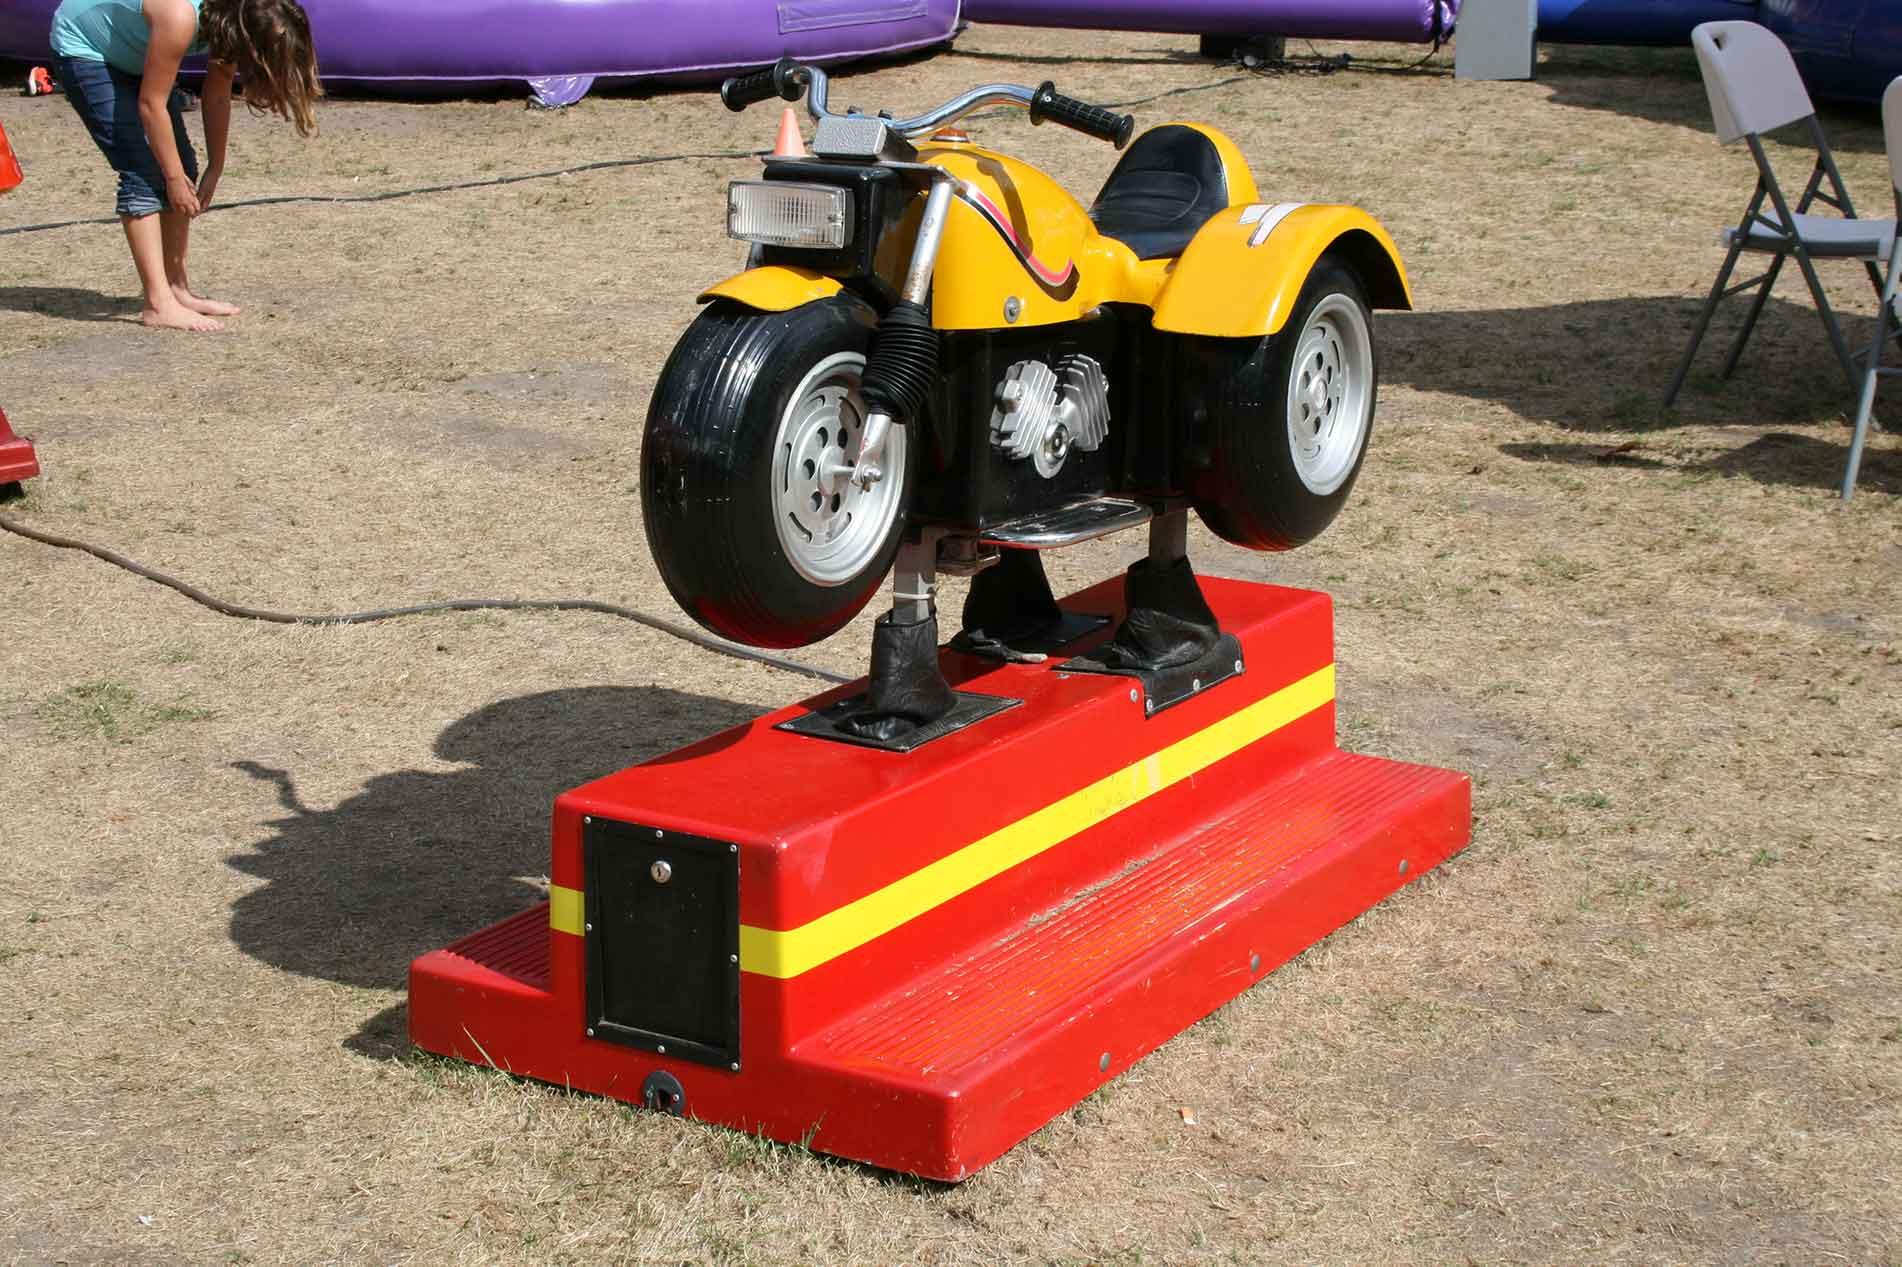 Kiddy-Ride-Funjoker-Mieten-Bild3